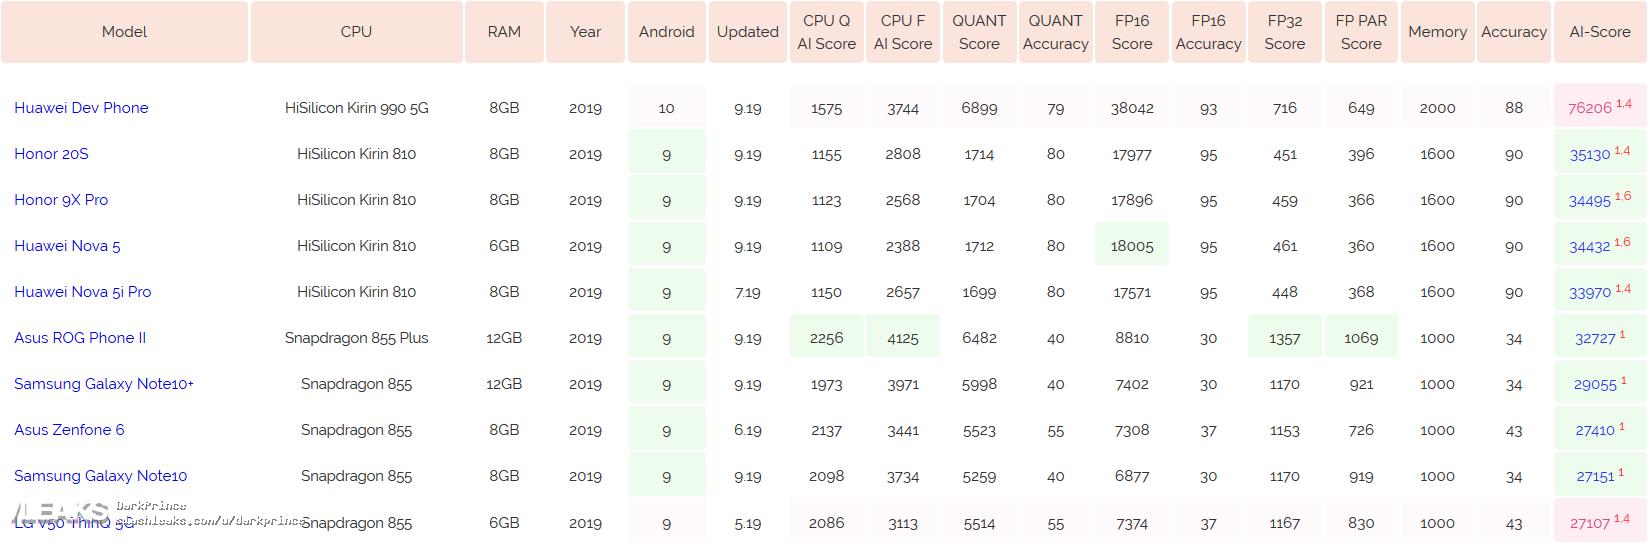 img Huawei Dev Phone (Kirin 990): Specs and AI Performance [UPDATED: Huawei Mate 30 5G]